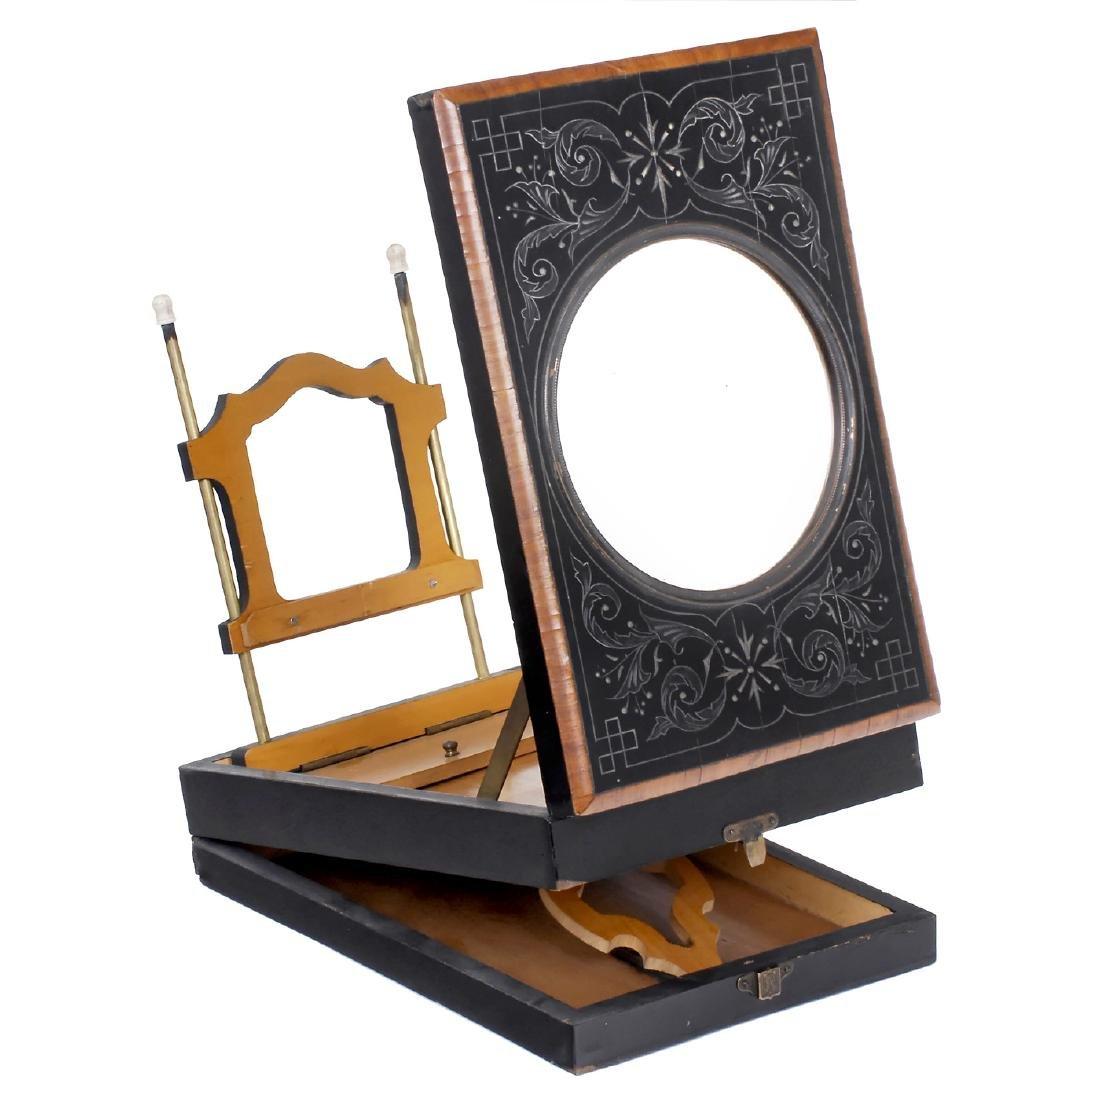 2 Graphoscopes, c. 1880 - 2